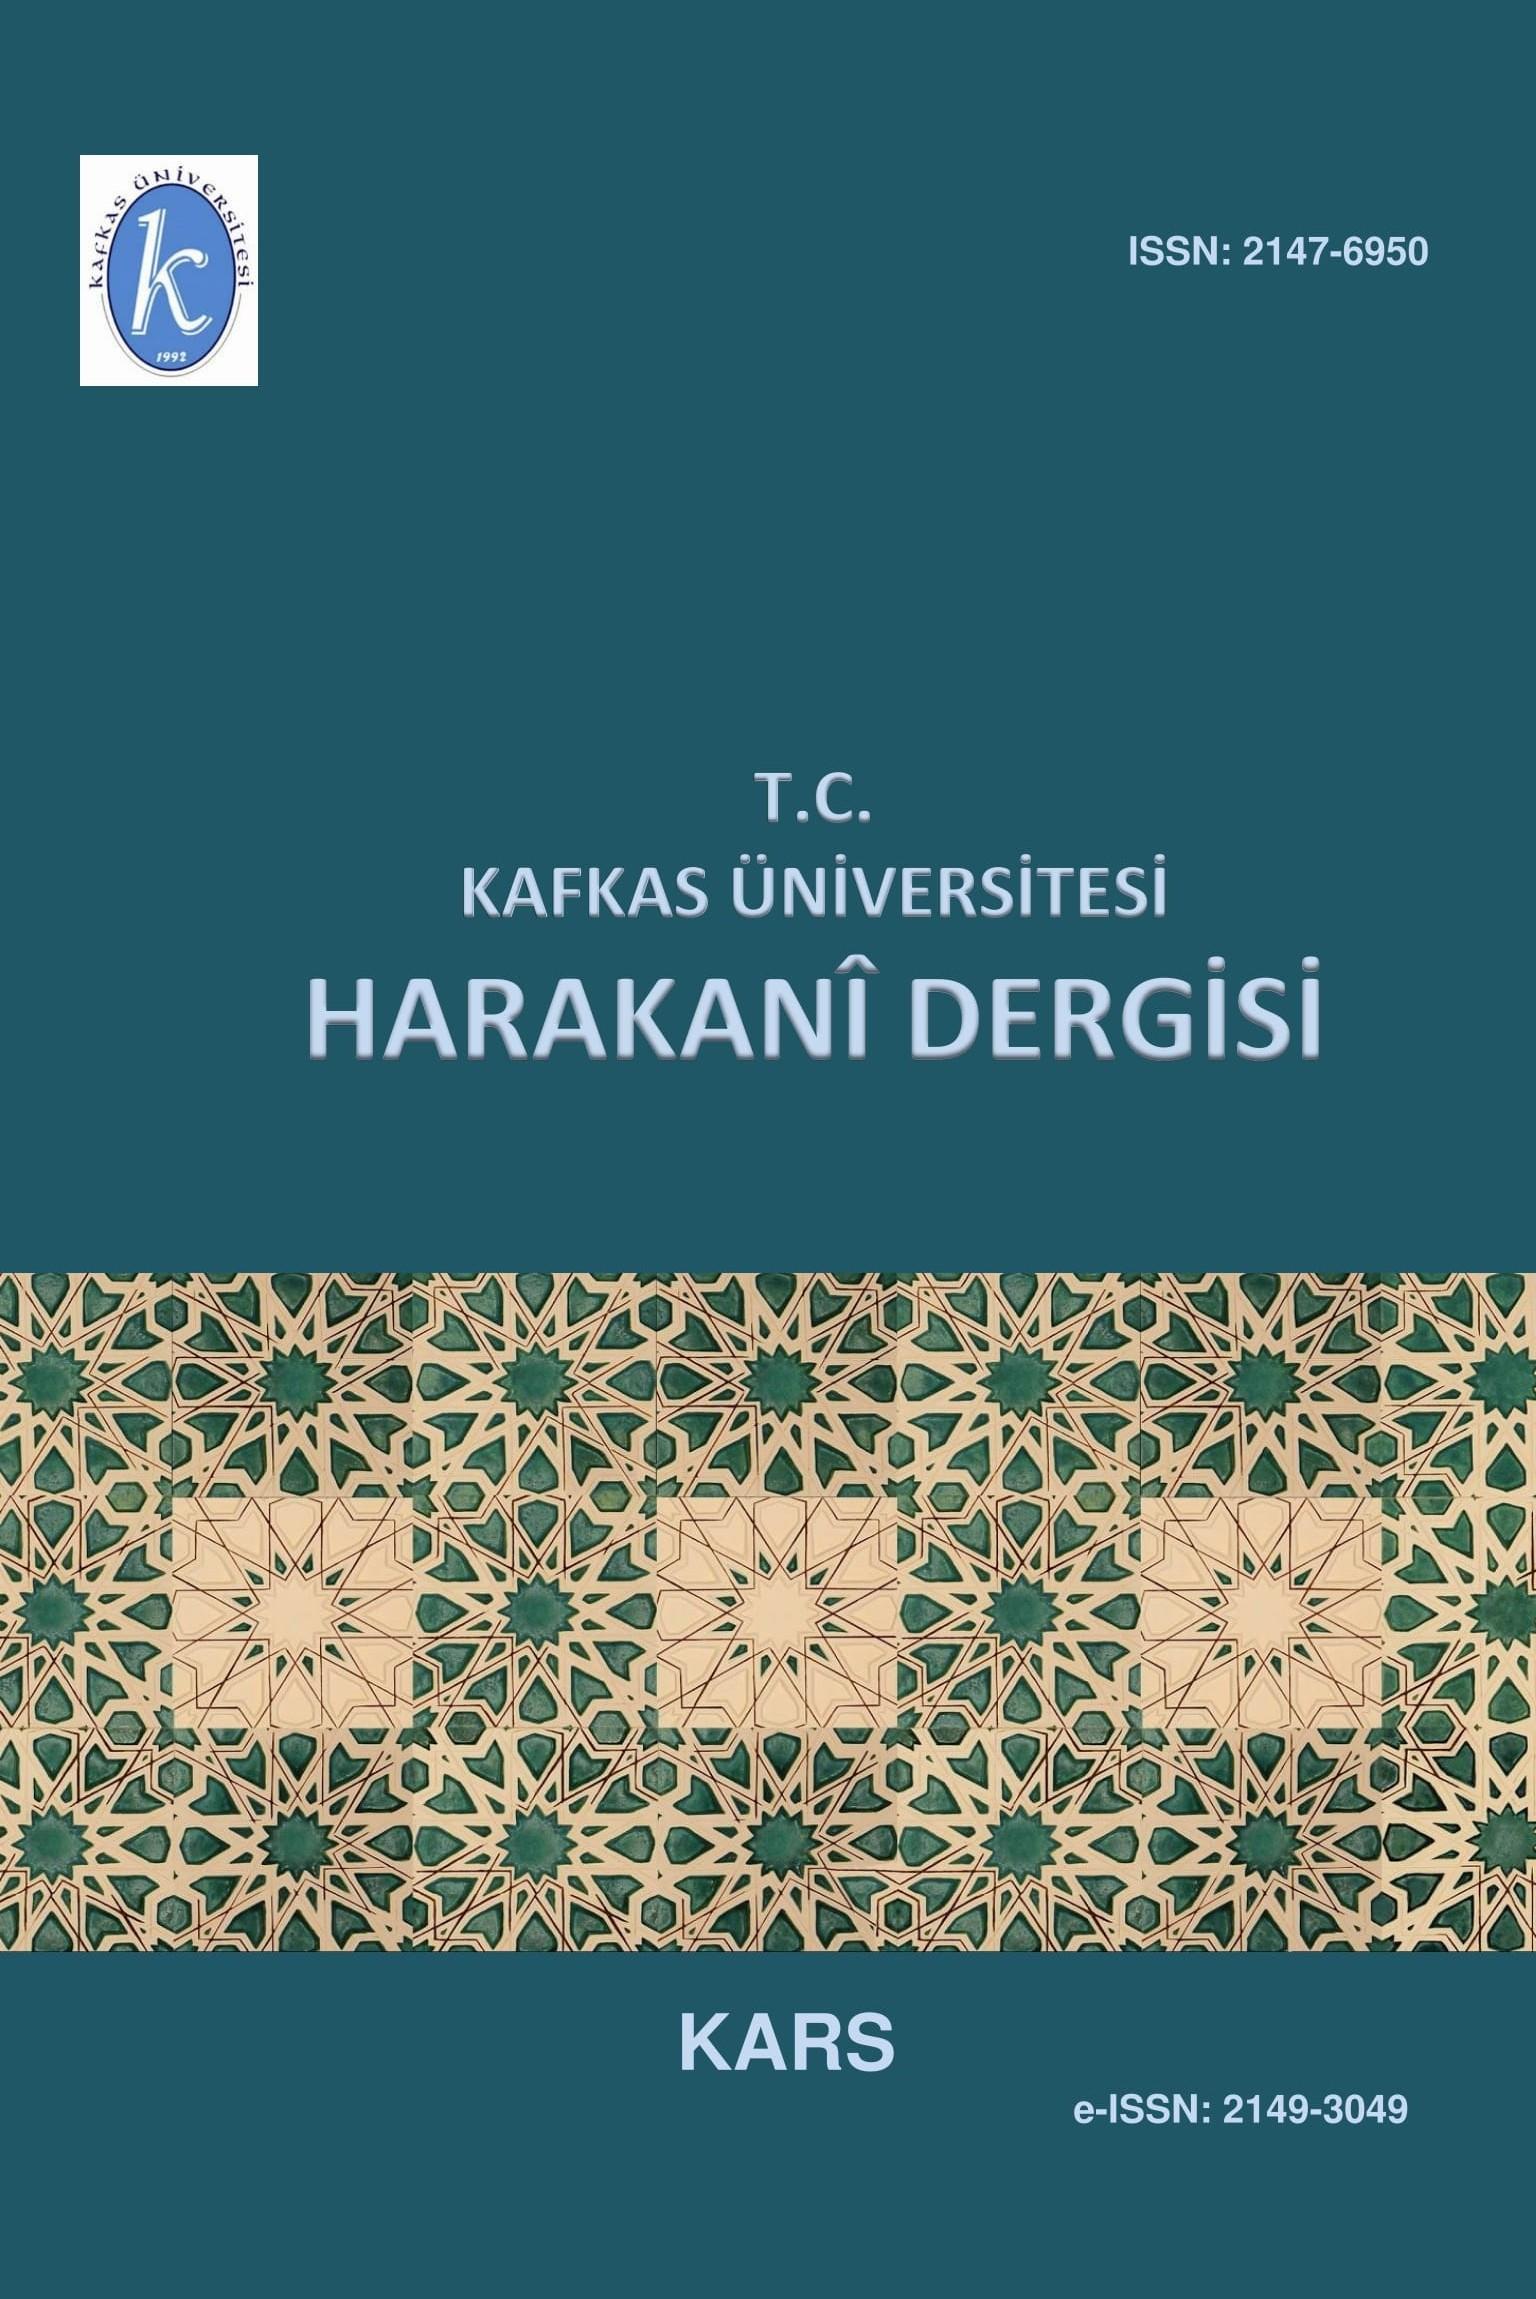 Kafkas Üniversitesi Harakani Dergisi